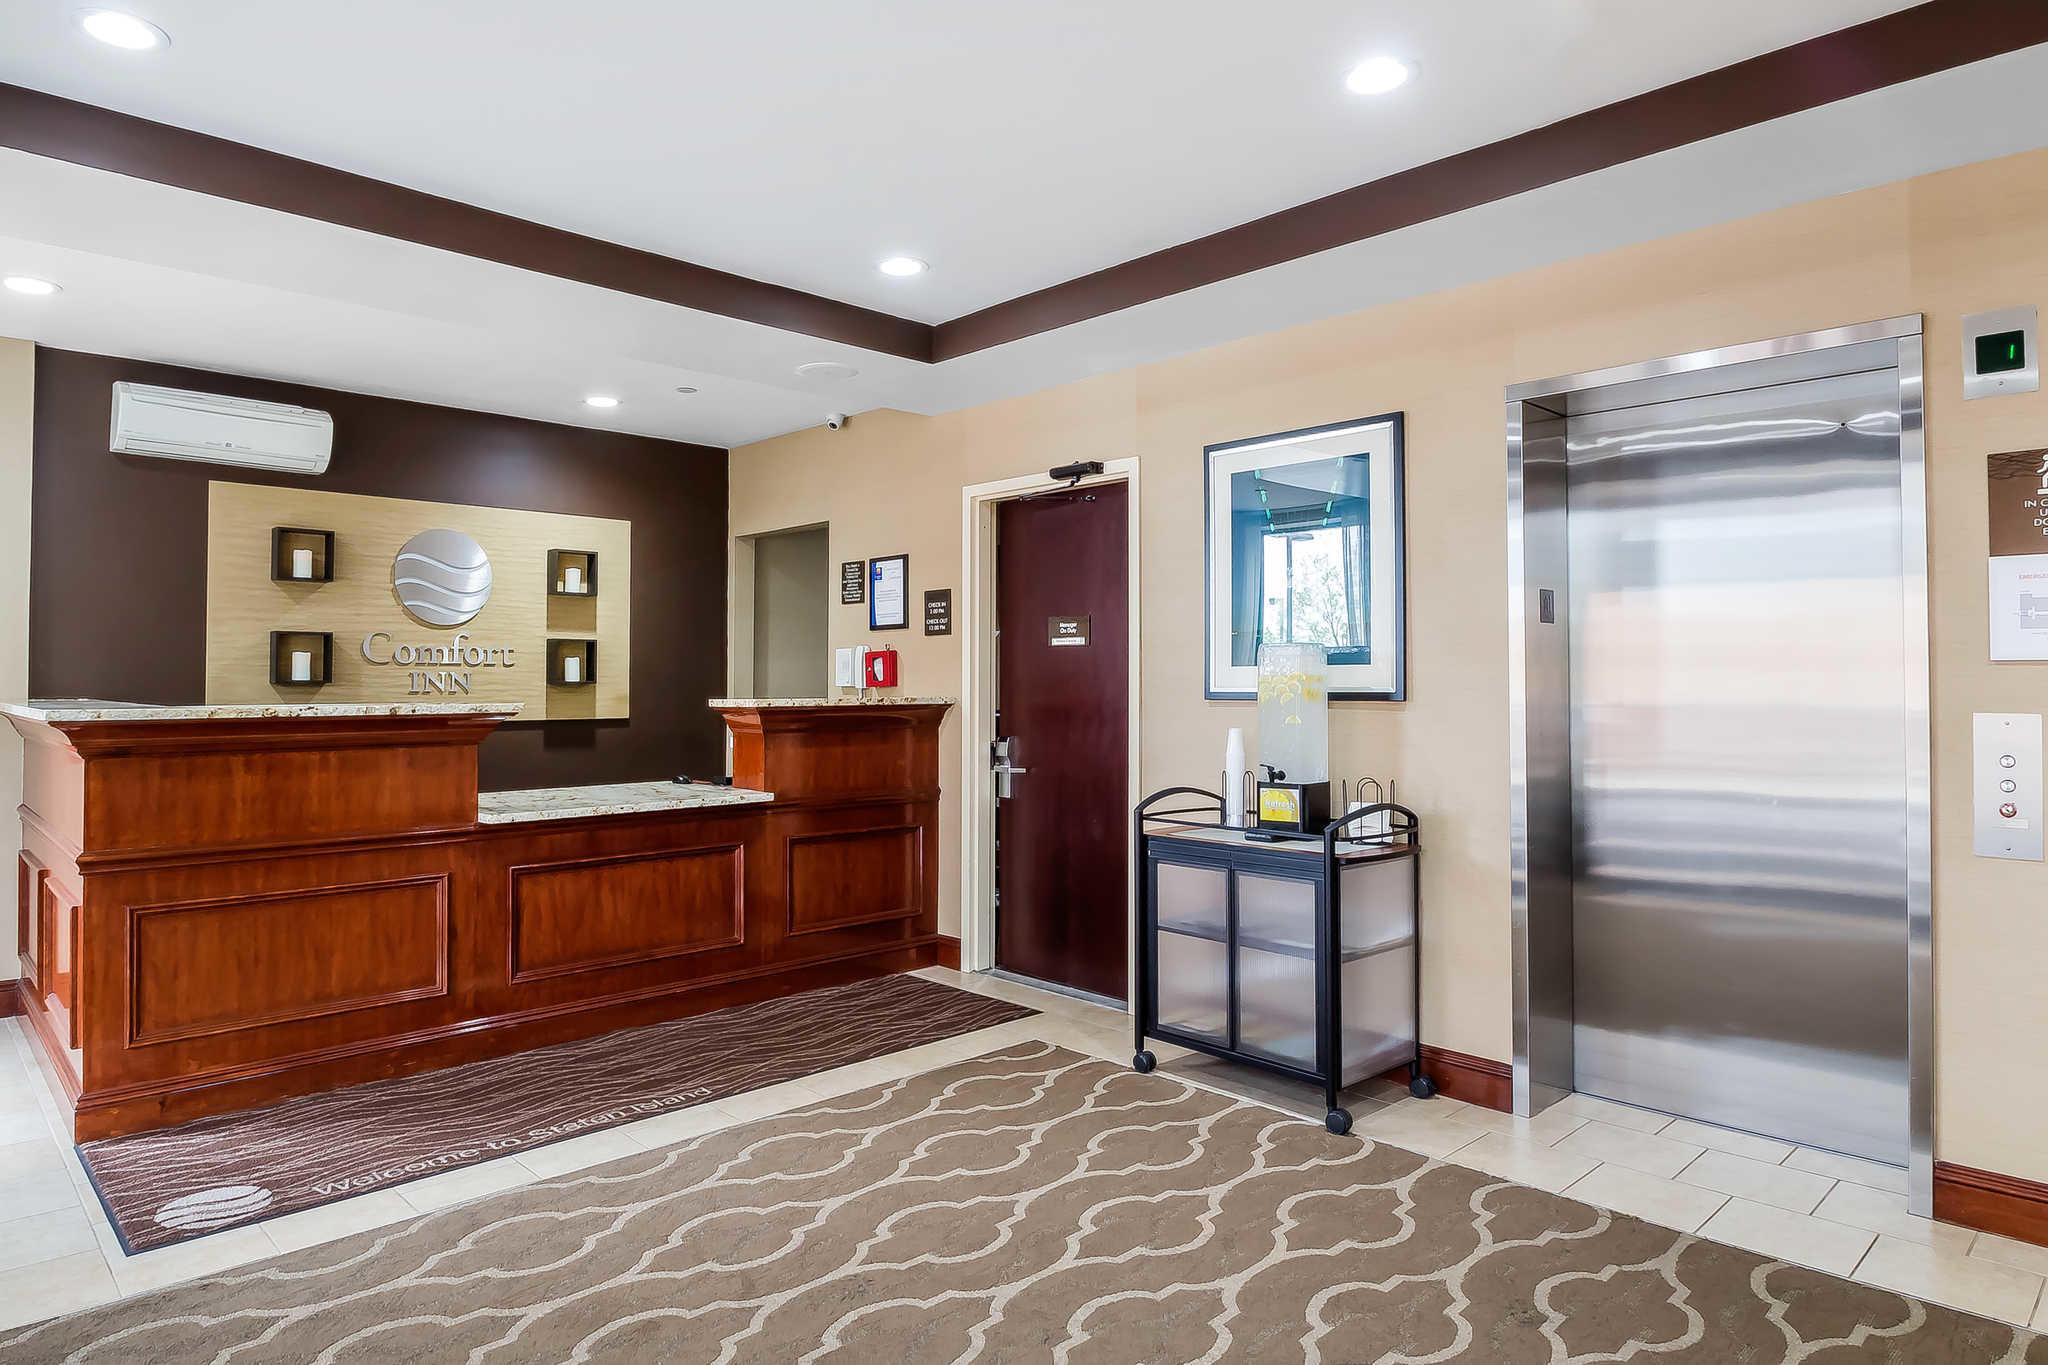 Comfort Inn Staten Island image 15